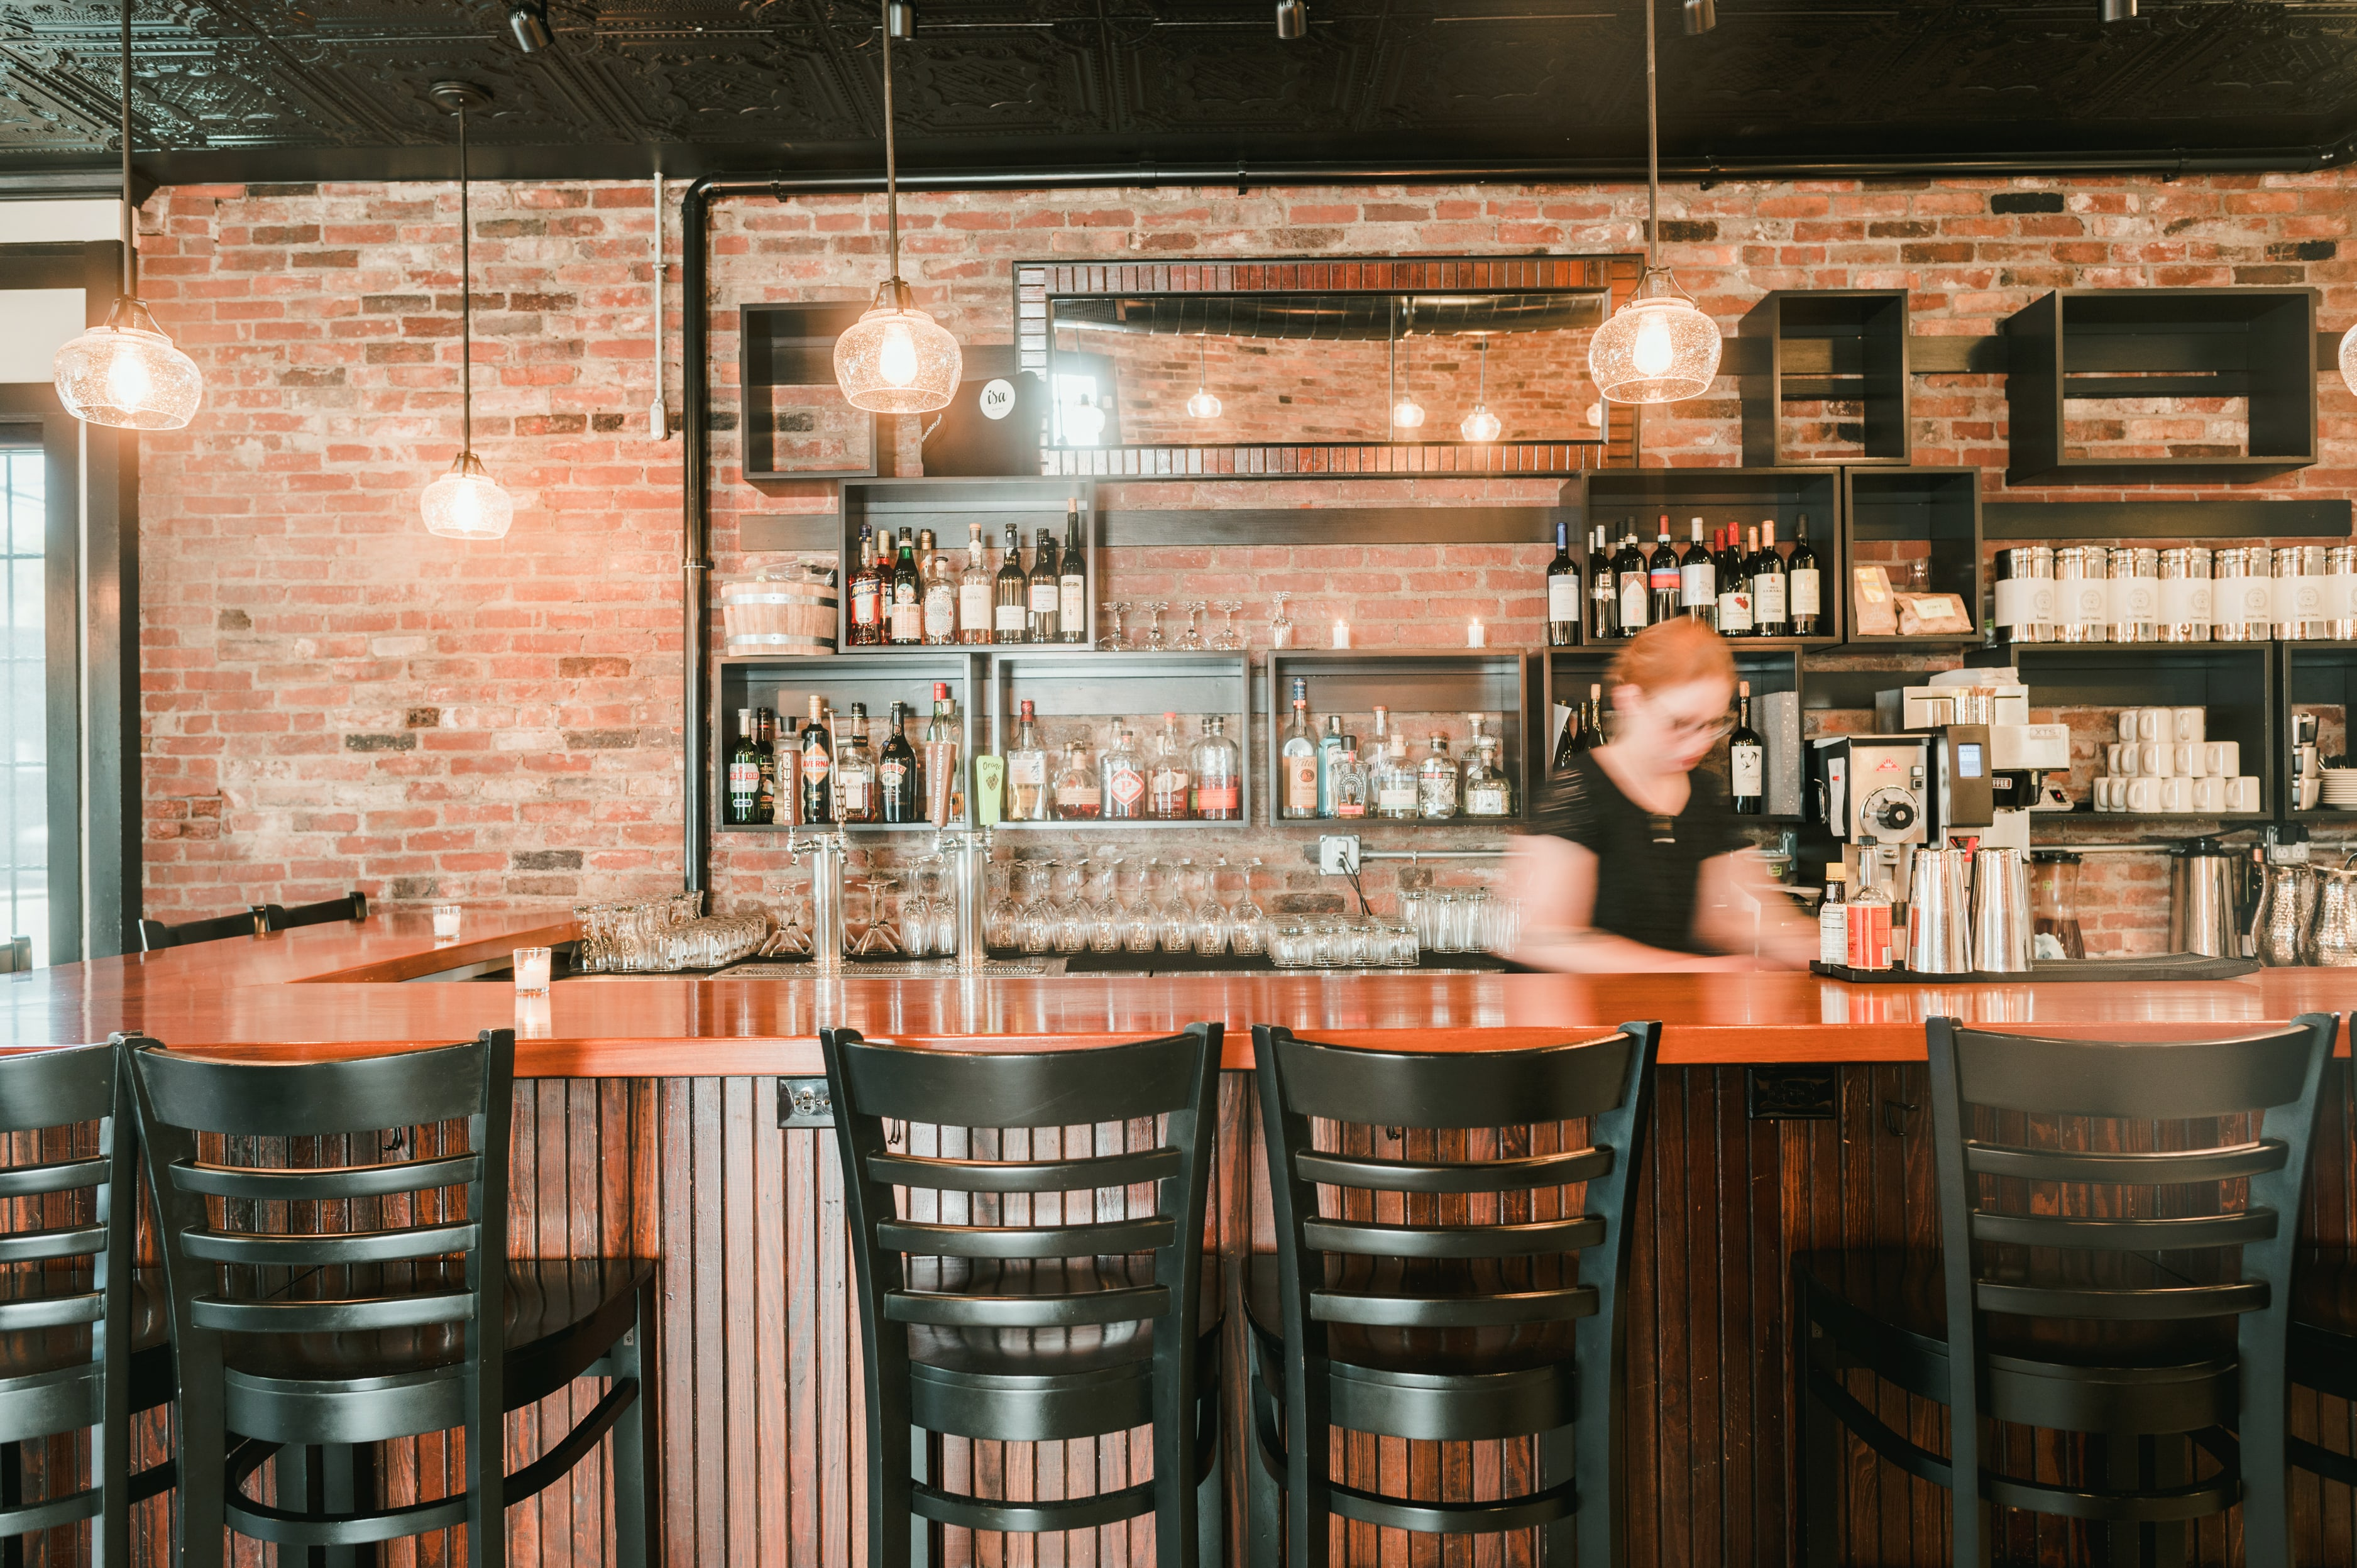 Isa Bistro bar and server